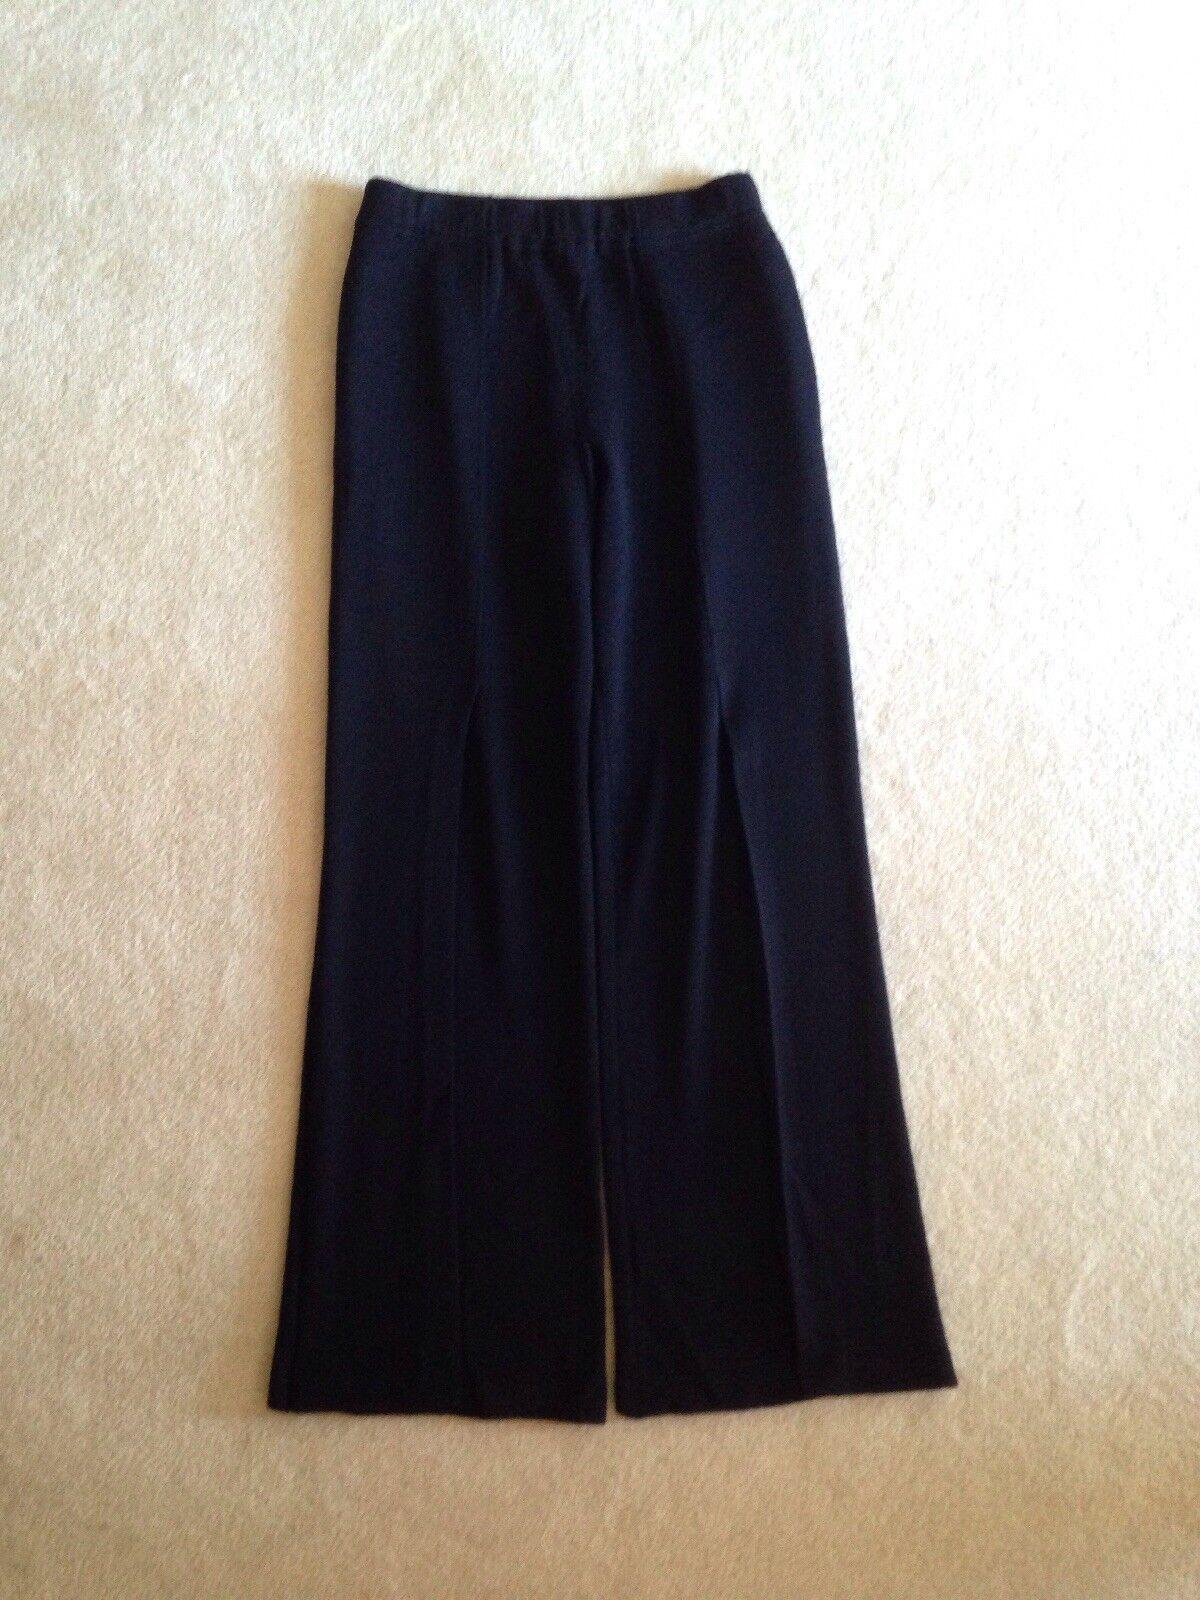 St John Evening Santana Knit Pants - Size 6 with Vent Overlay Pant Leg EUC